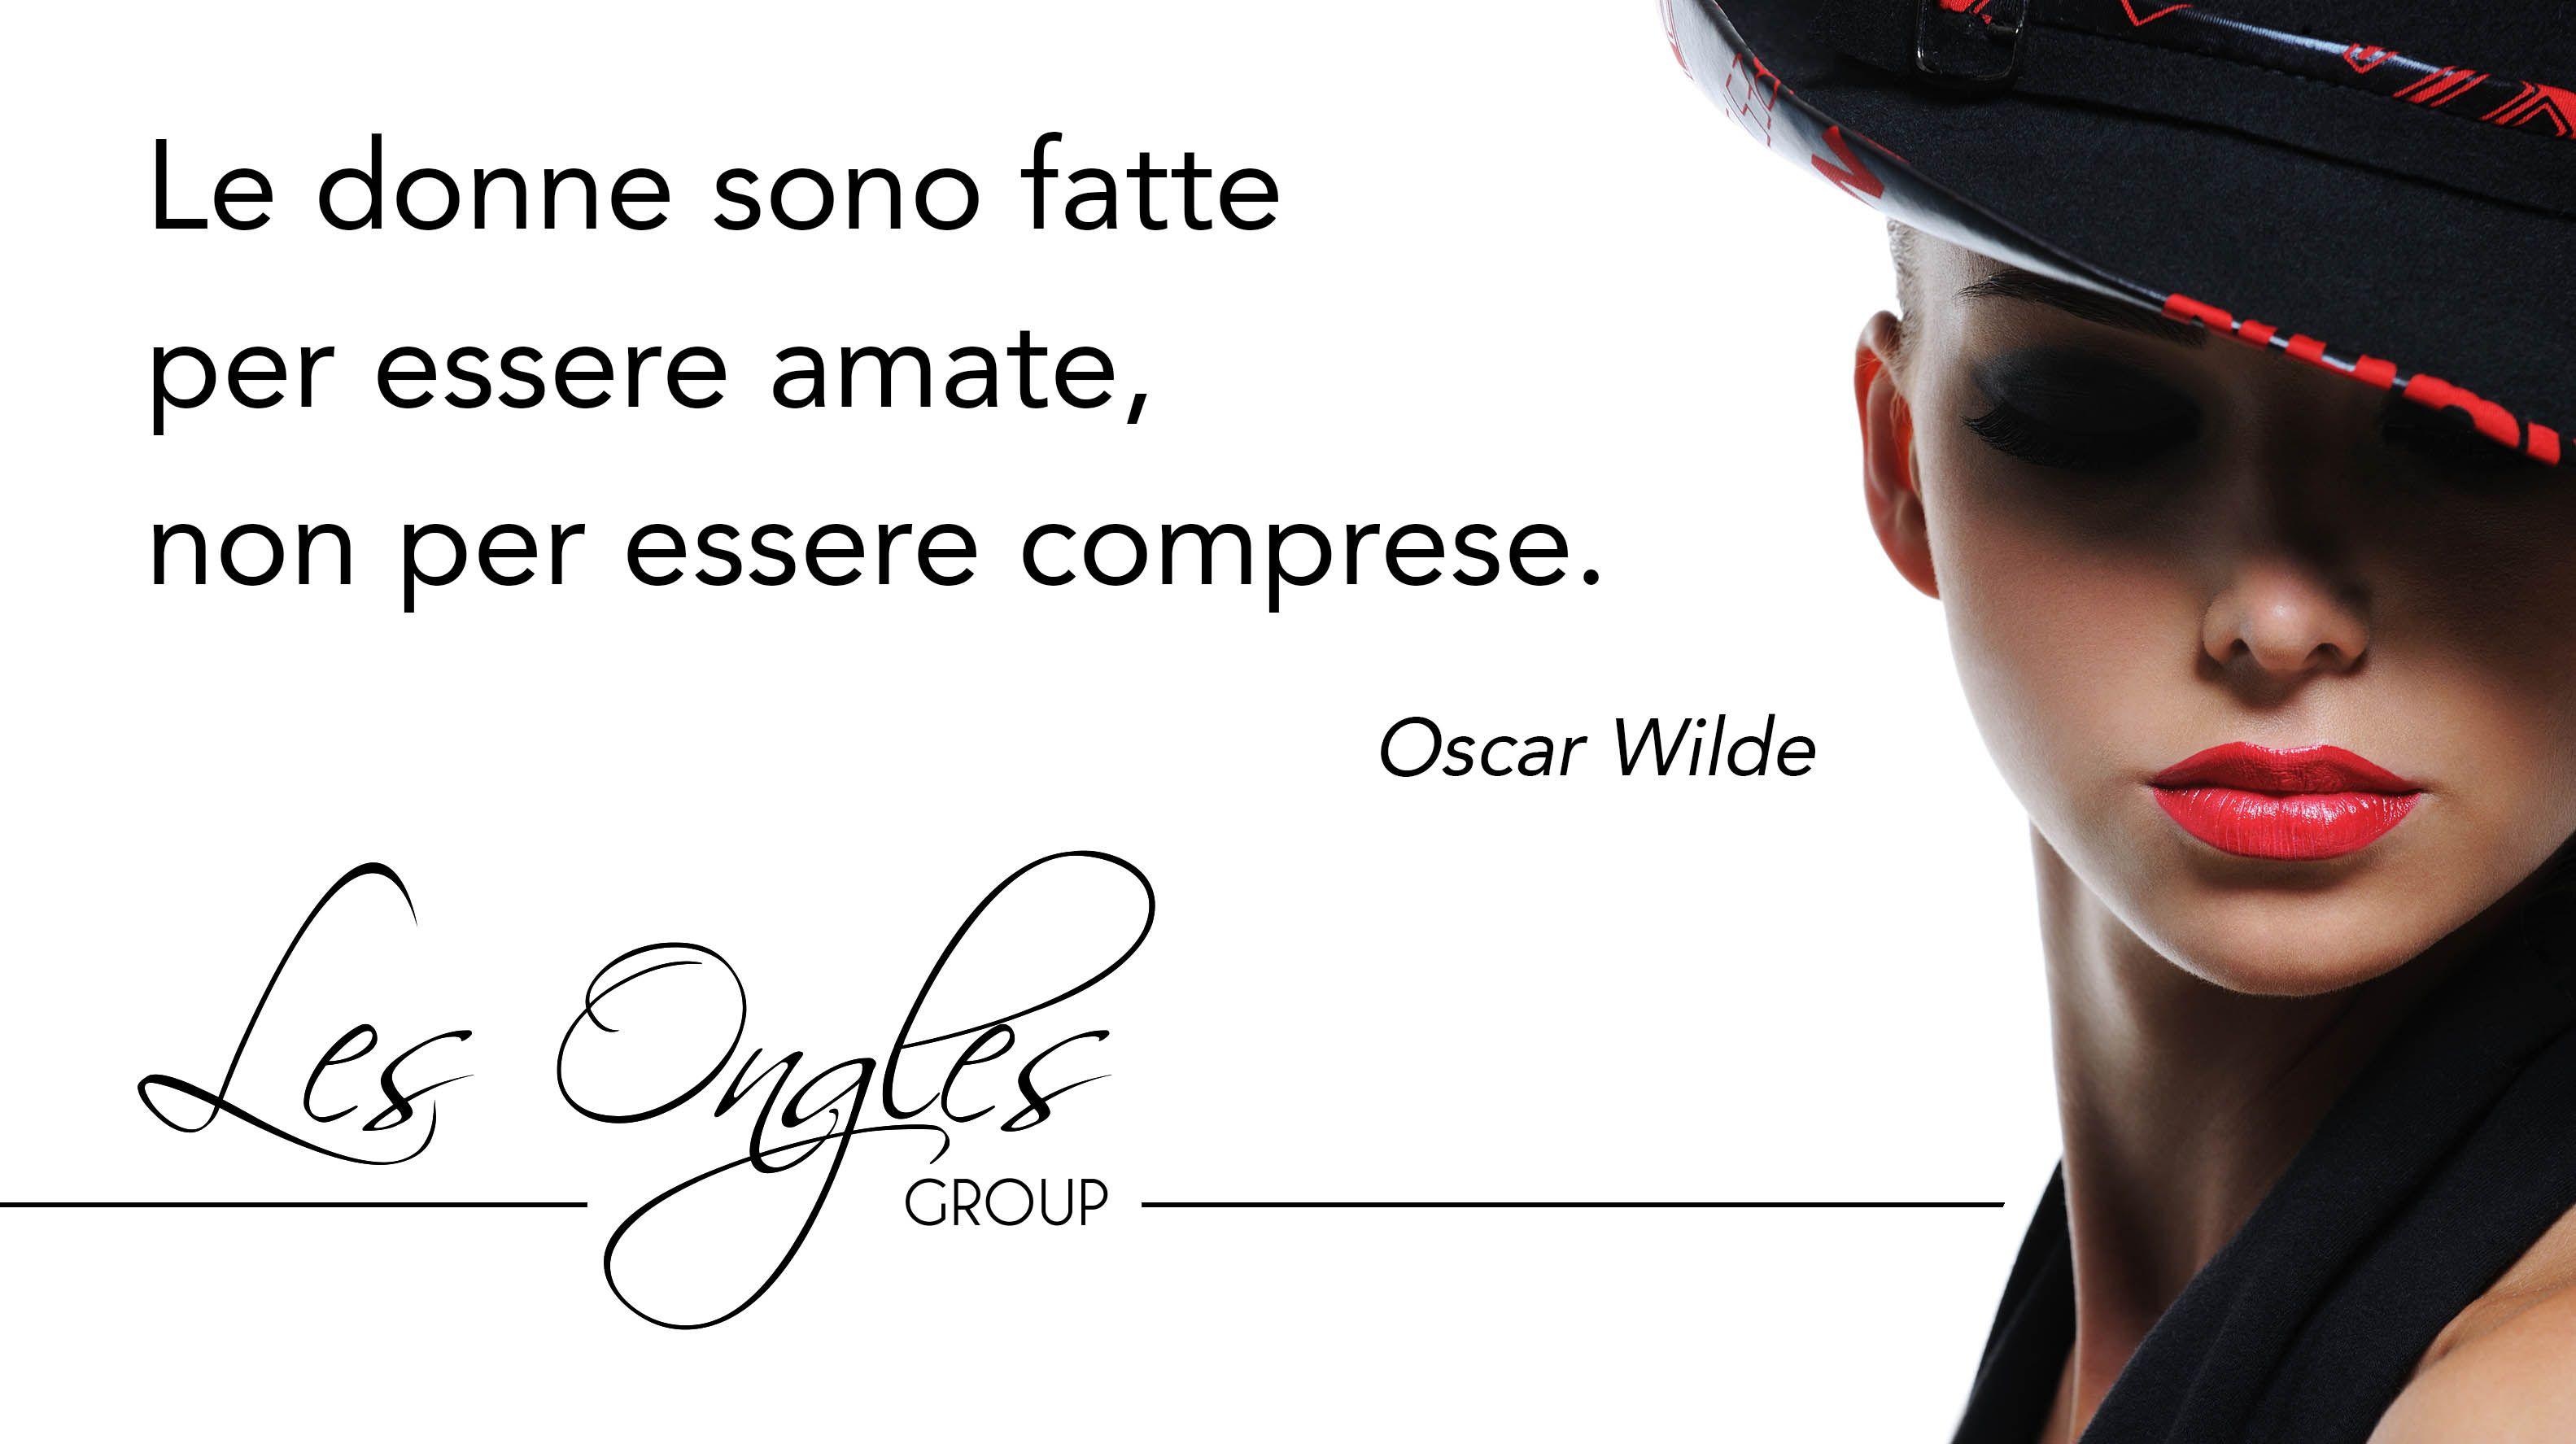 Frasi Di Natale Oscar Wilde.Pin Su Les Ongles Group